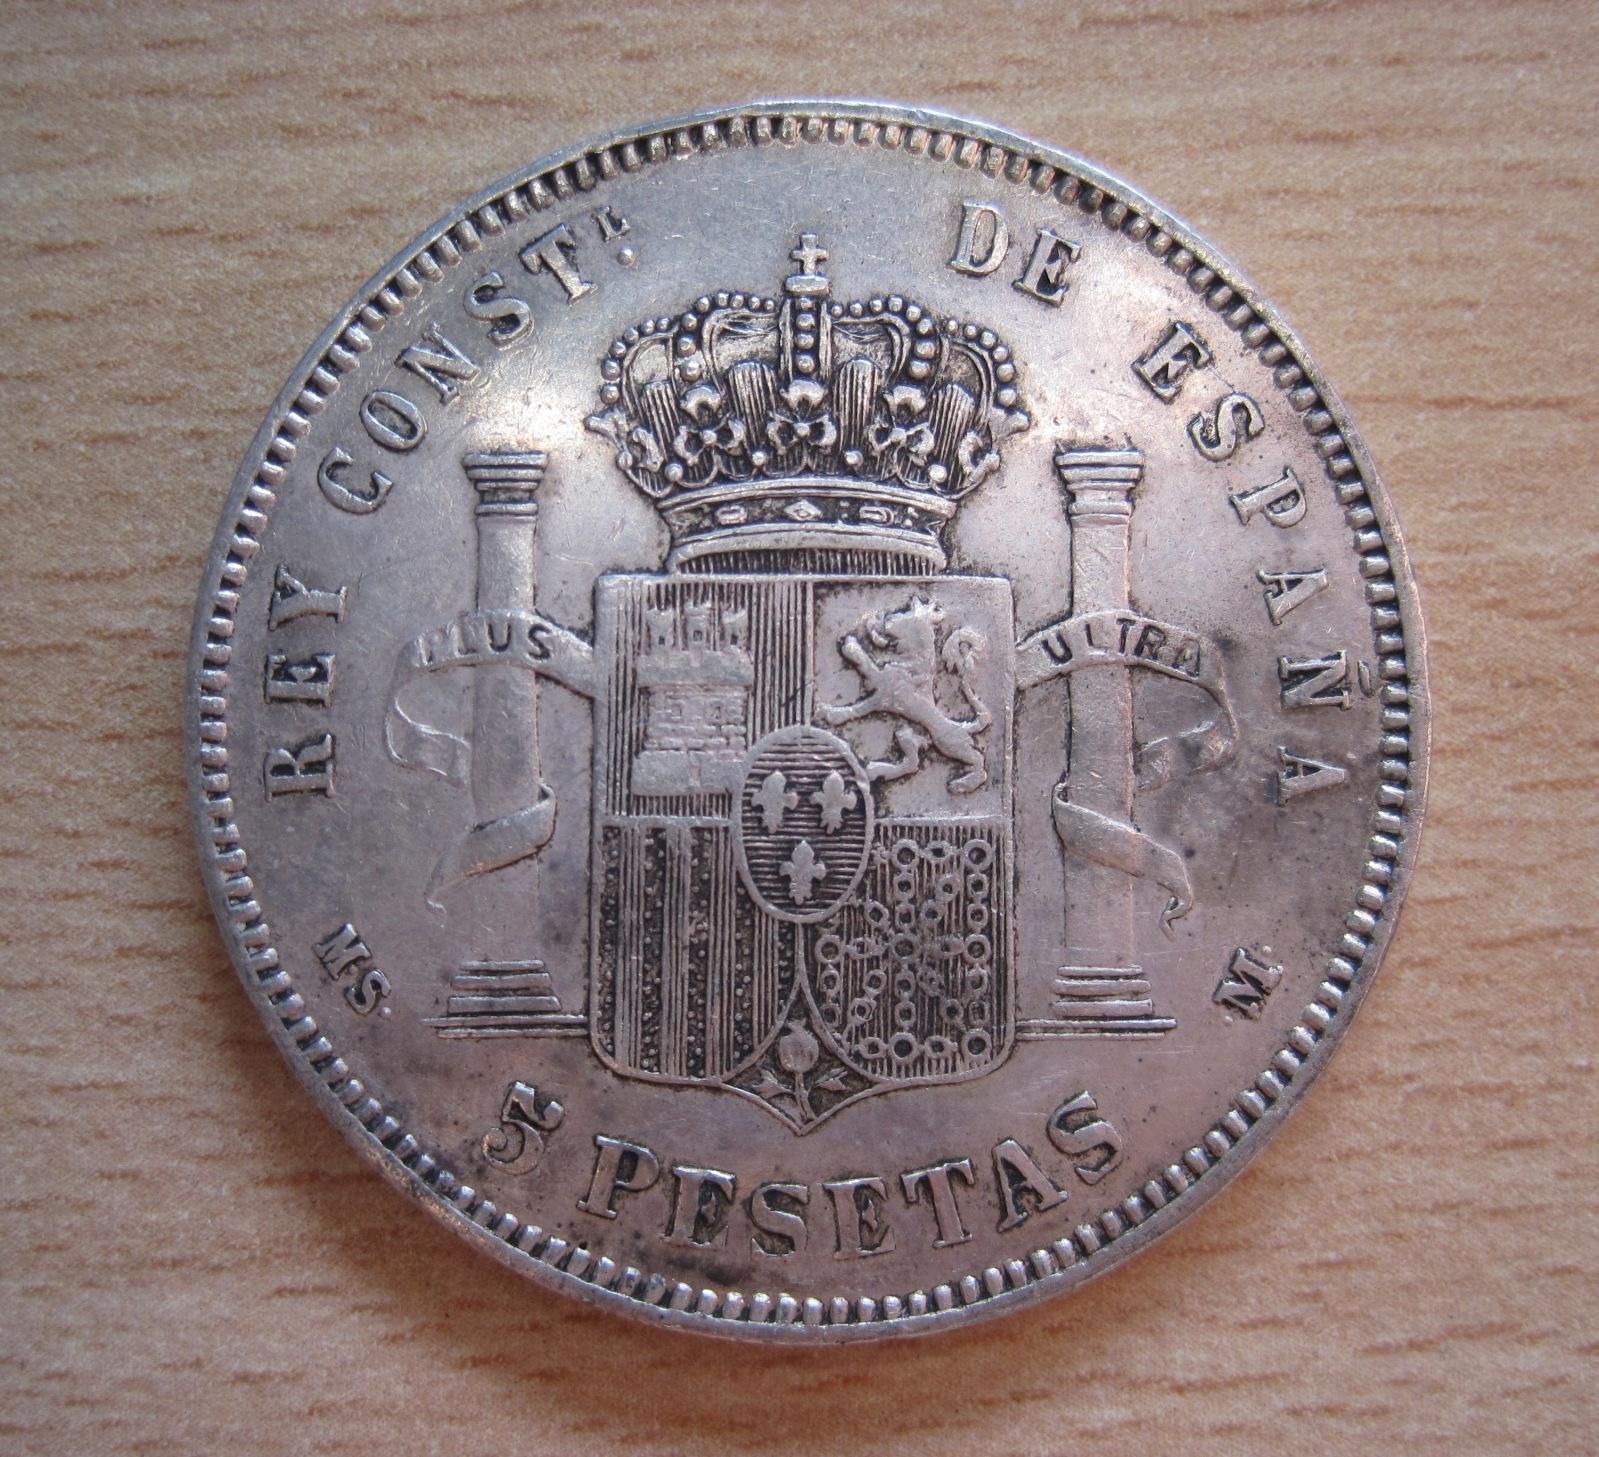 5 Pesetas 1884, Falsa Duro Sevillano 2j64l75